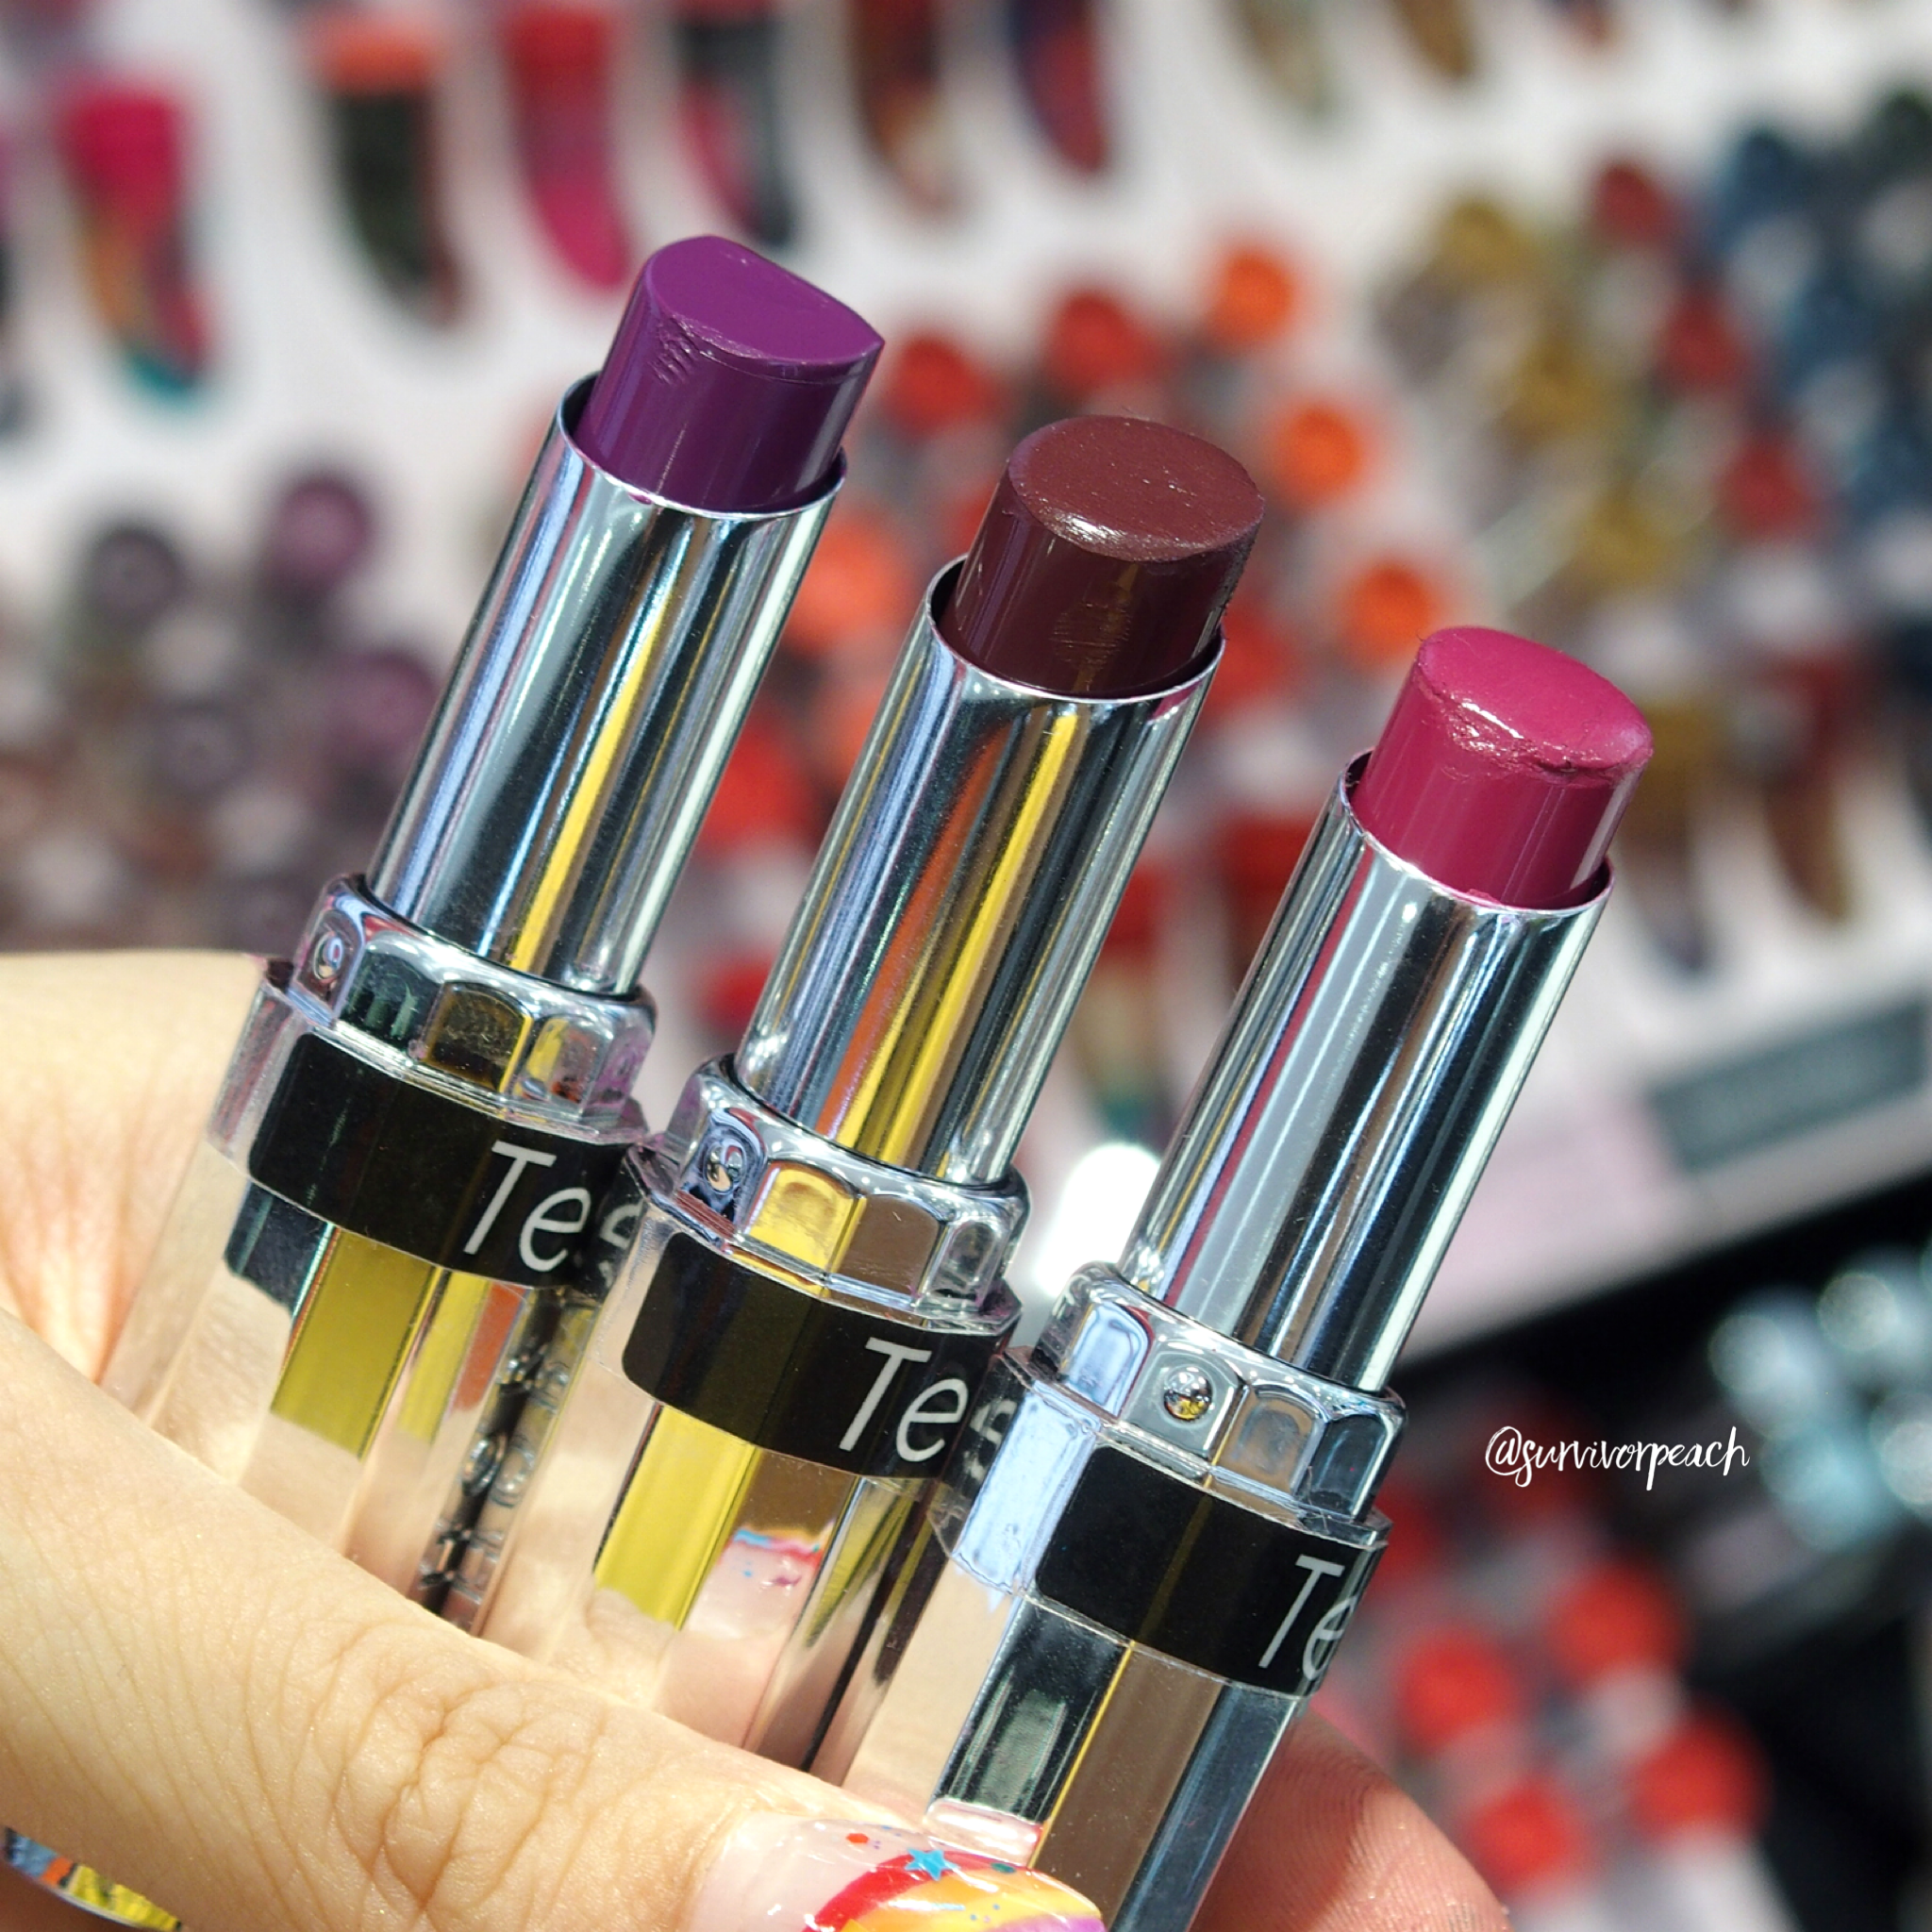 Sephora Collection Lipstick Rouge Lacquer Lipstick - L05 What's My Secret?, L06 Who Runs the World?, L07 Elegance